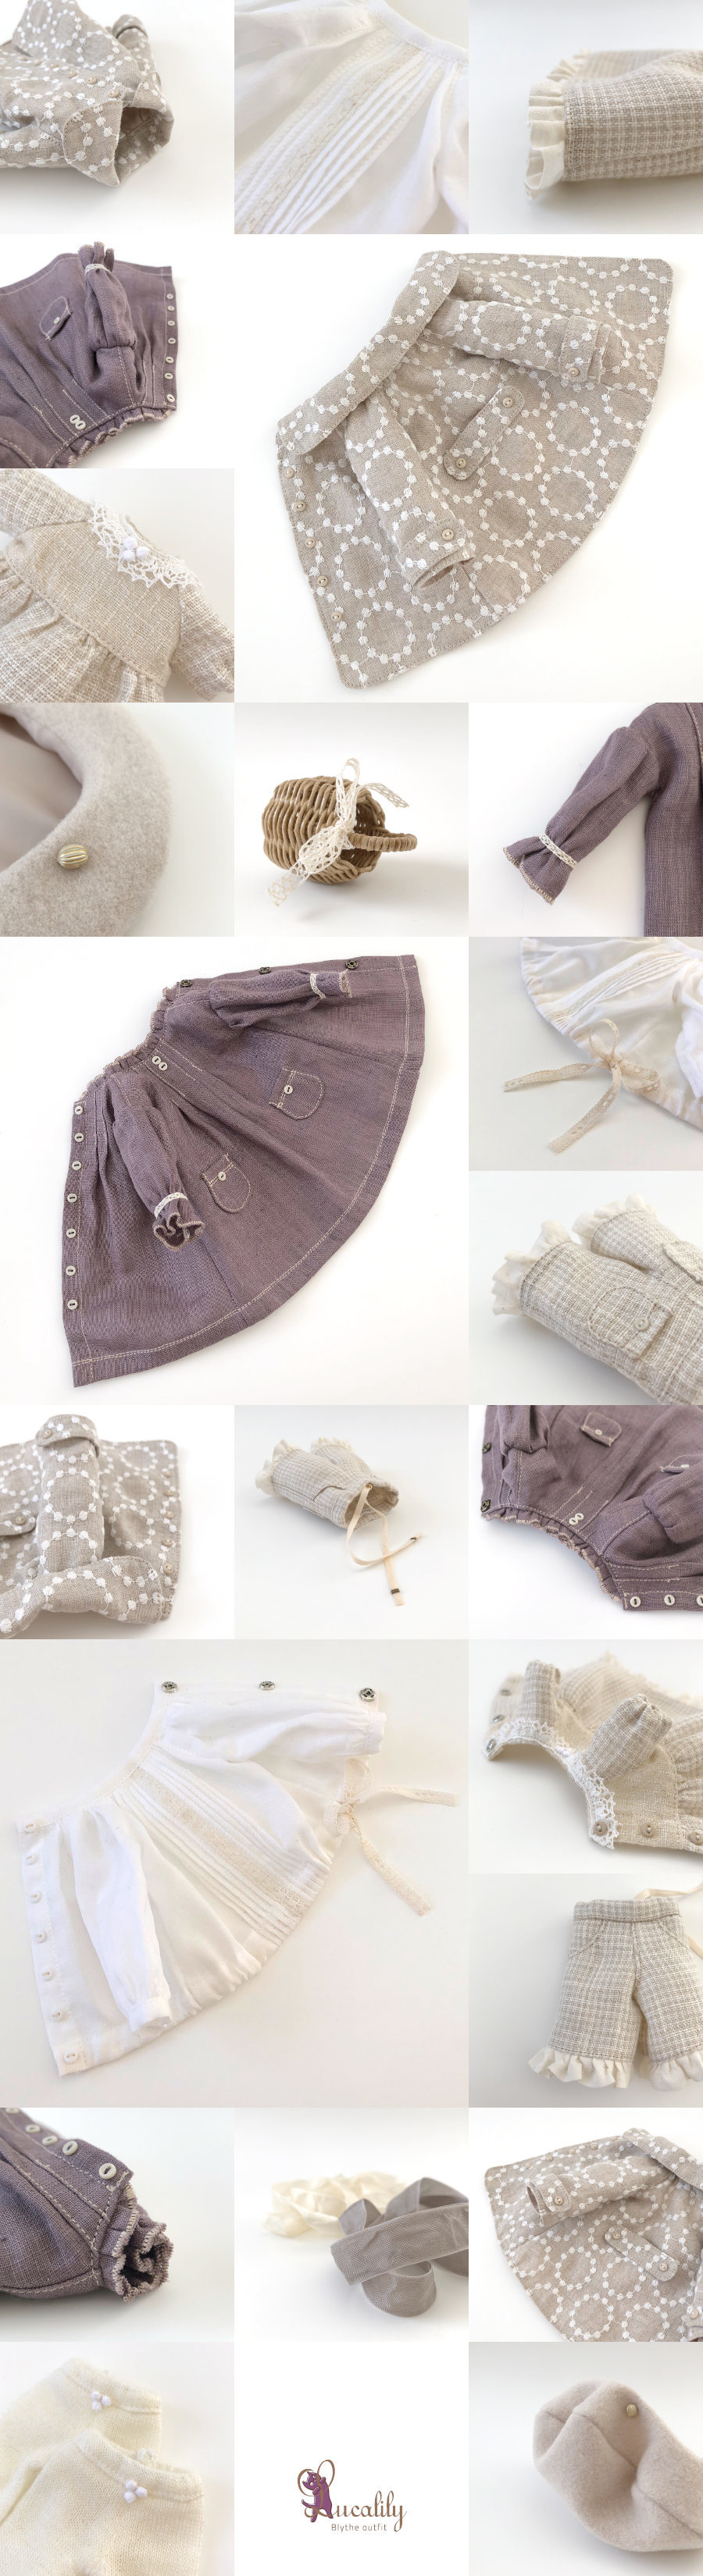 *lucalily * dolls clothes* Spring Coat Set *_d0217189_21471434.jpg